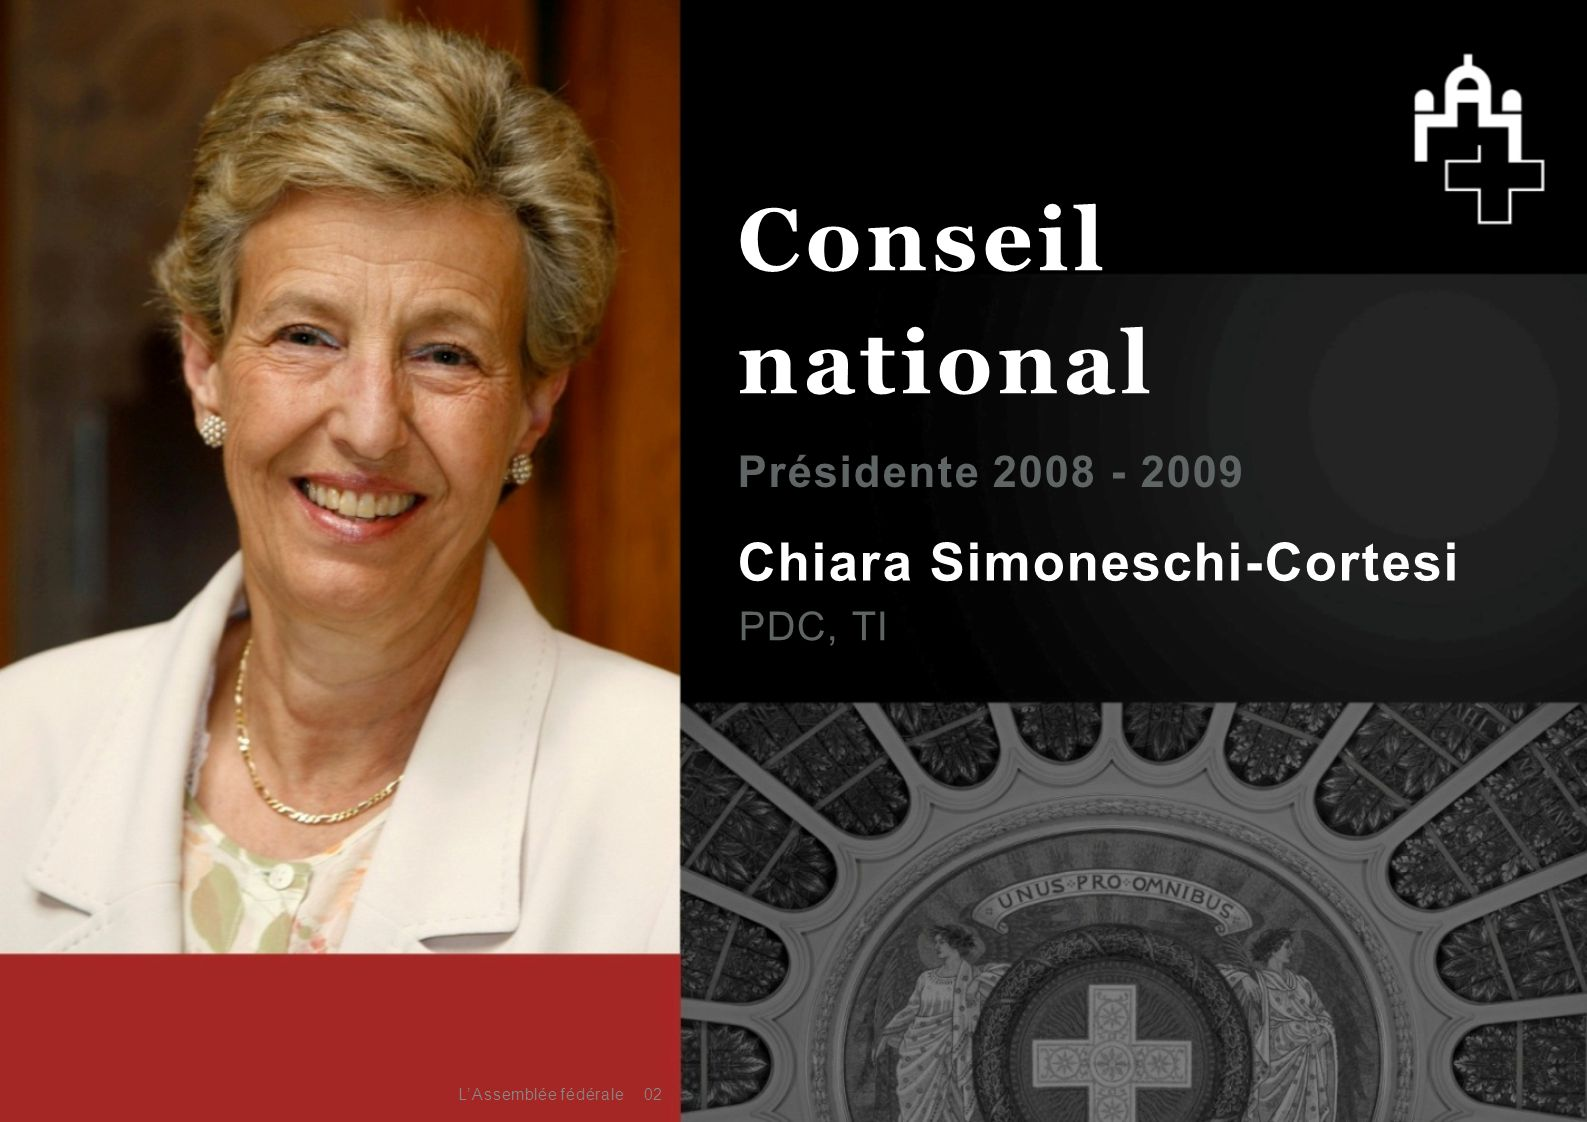 Chiara Simoneschi-Cortesi